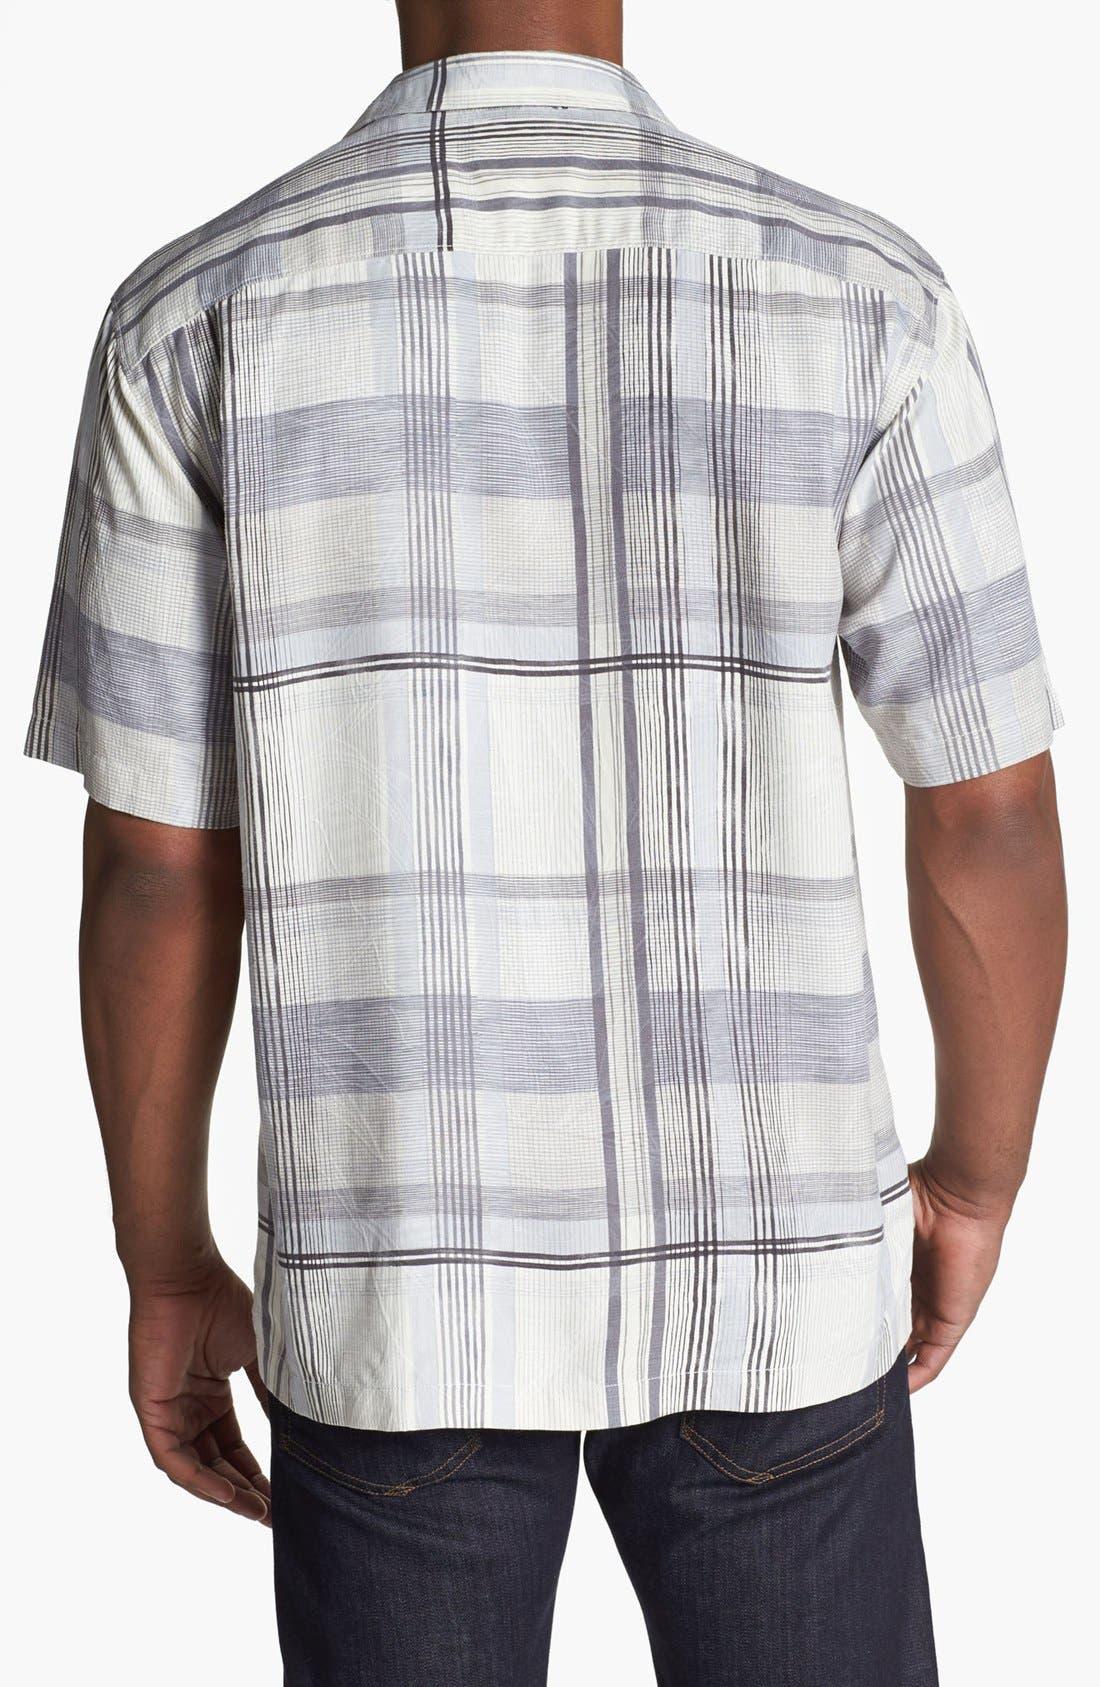 Alternate Image 2  - Tommy Bahama 'Plaid Vallarta' Silk Campshirt